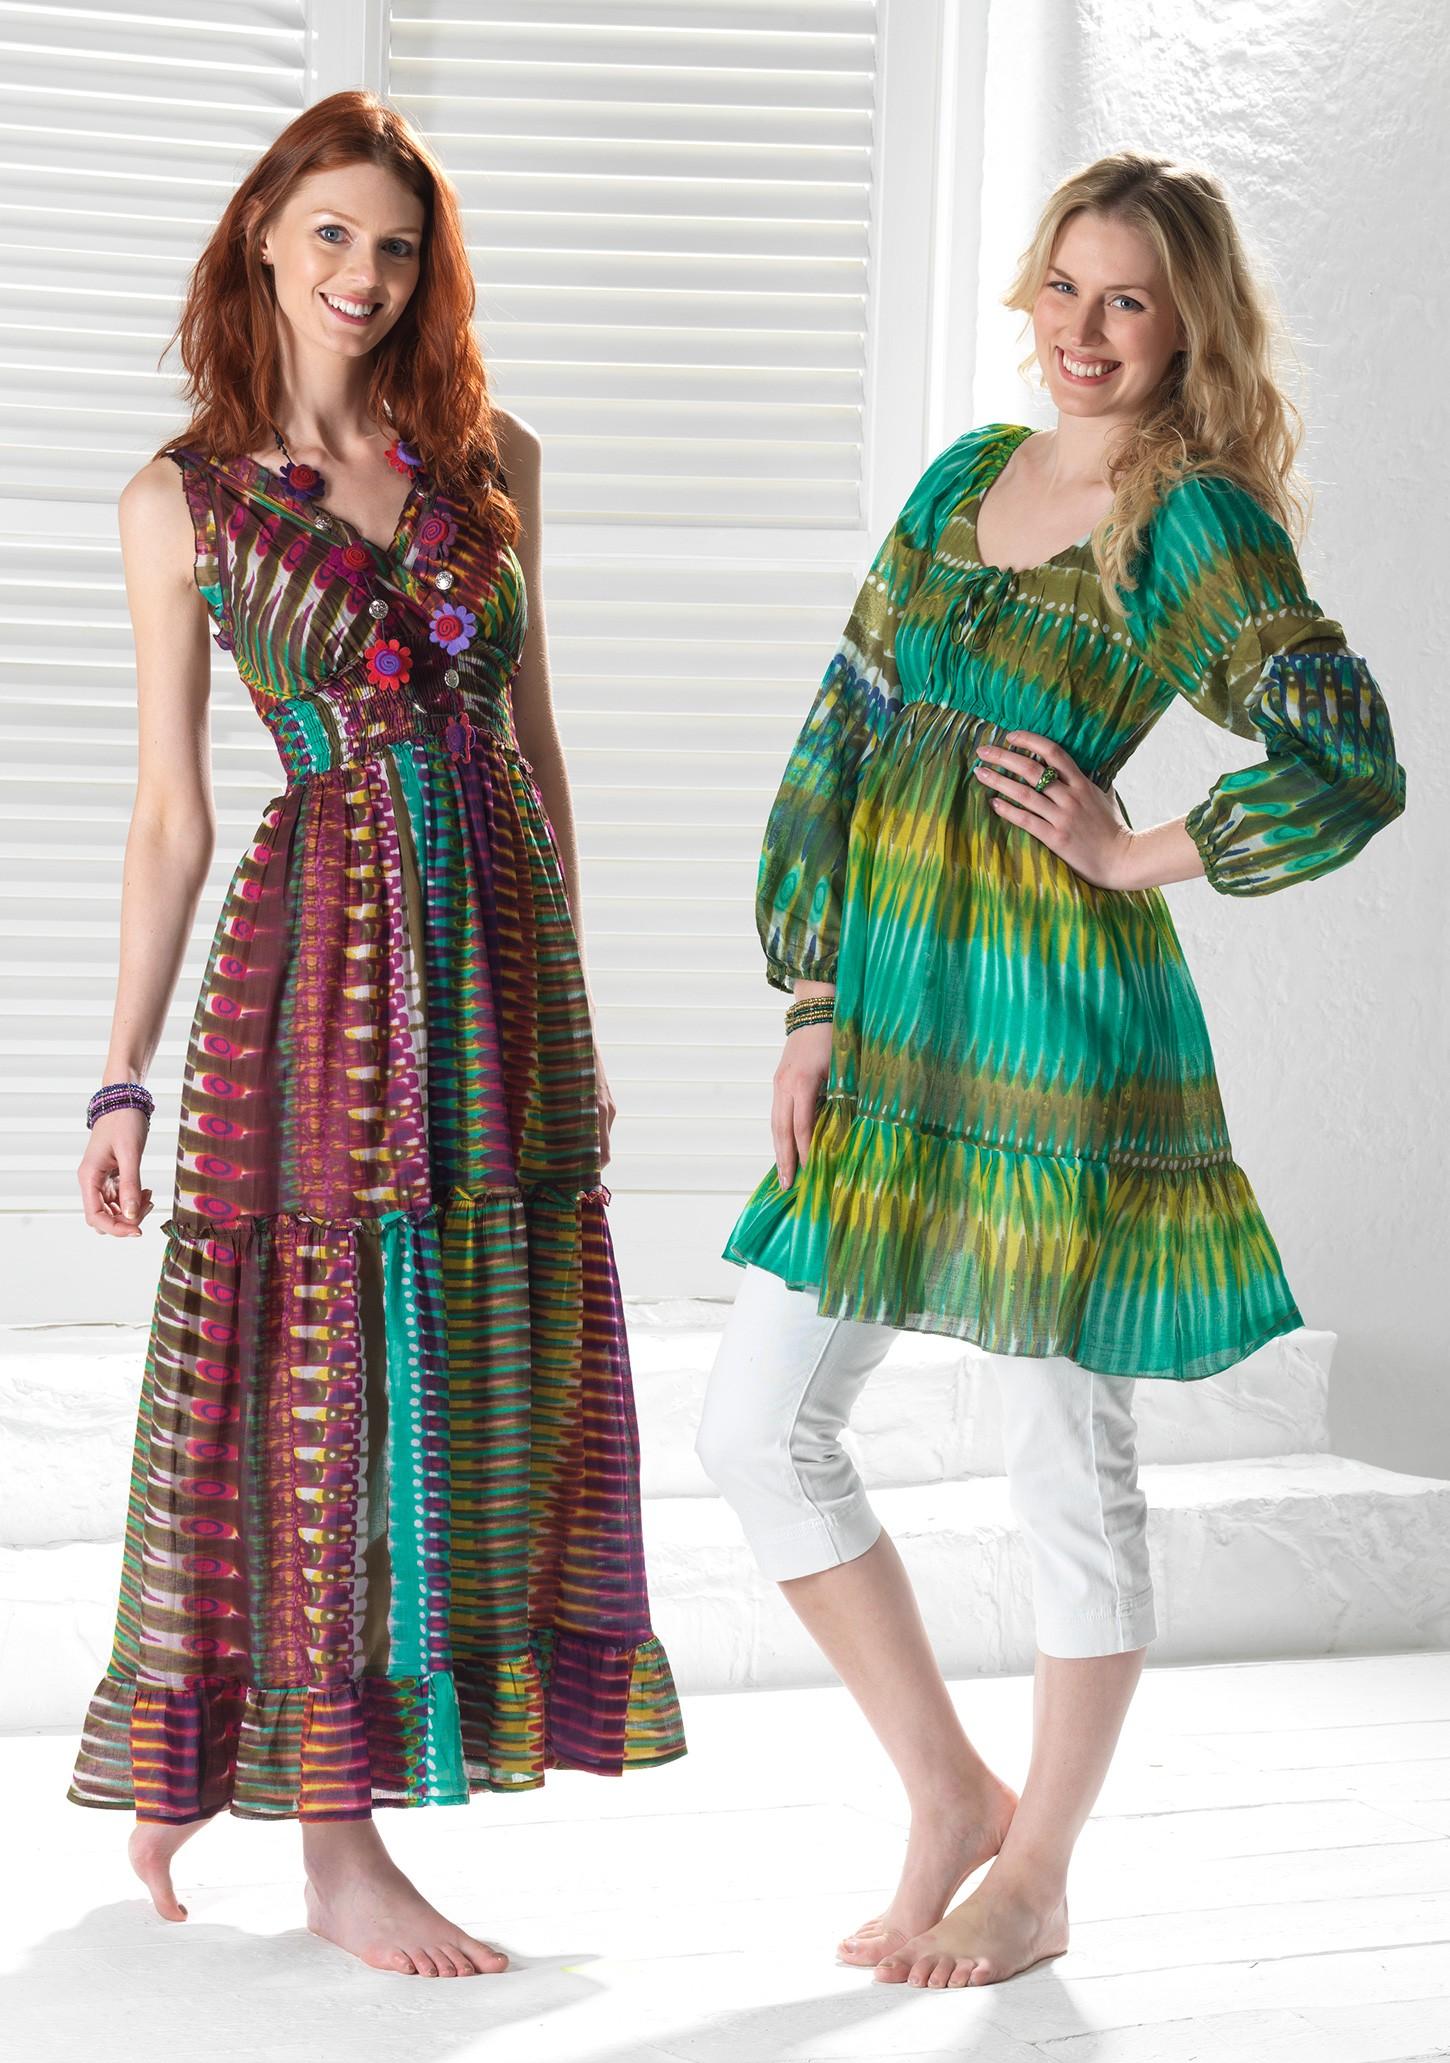 b5100db9c5 Long sleeve tie dye tunic > Sale Long and short sleeved tunic tops ...